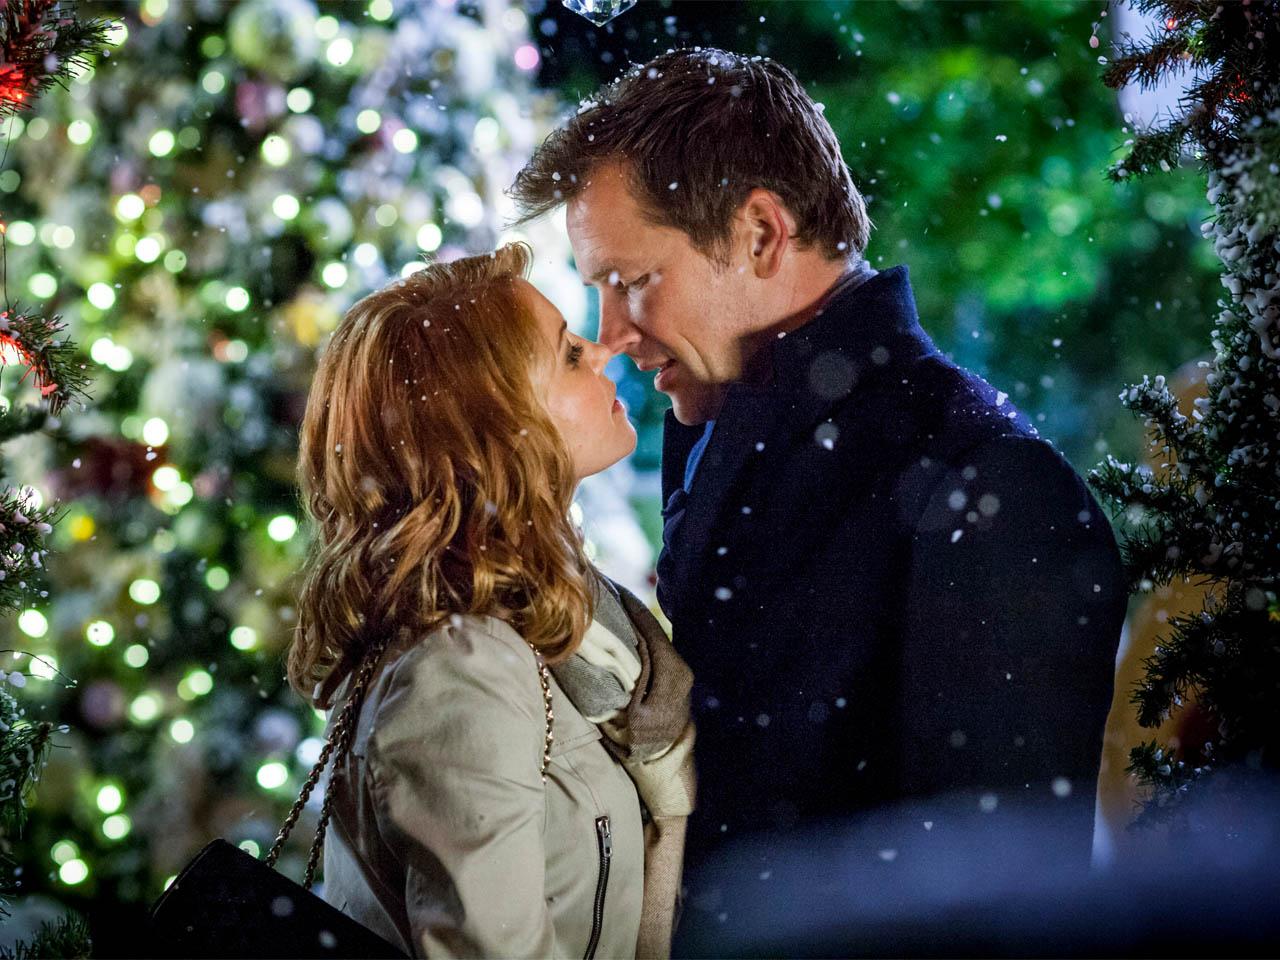 Hallmark Christmas Movies - A Christmas Detour - Marcel Williams - Crown Media - 1280 - Featured - 01